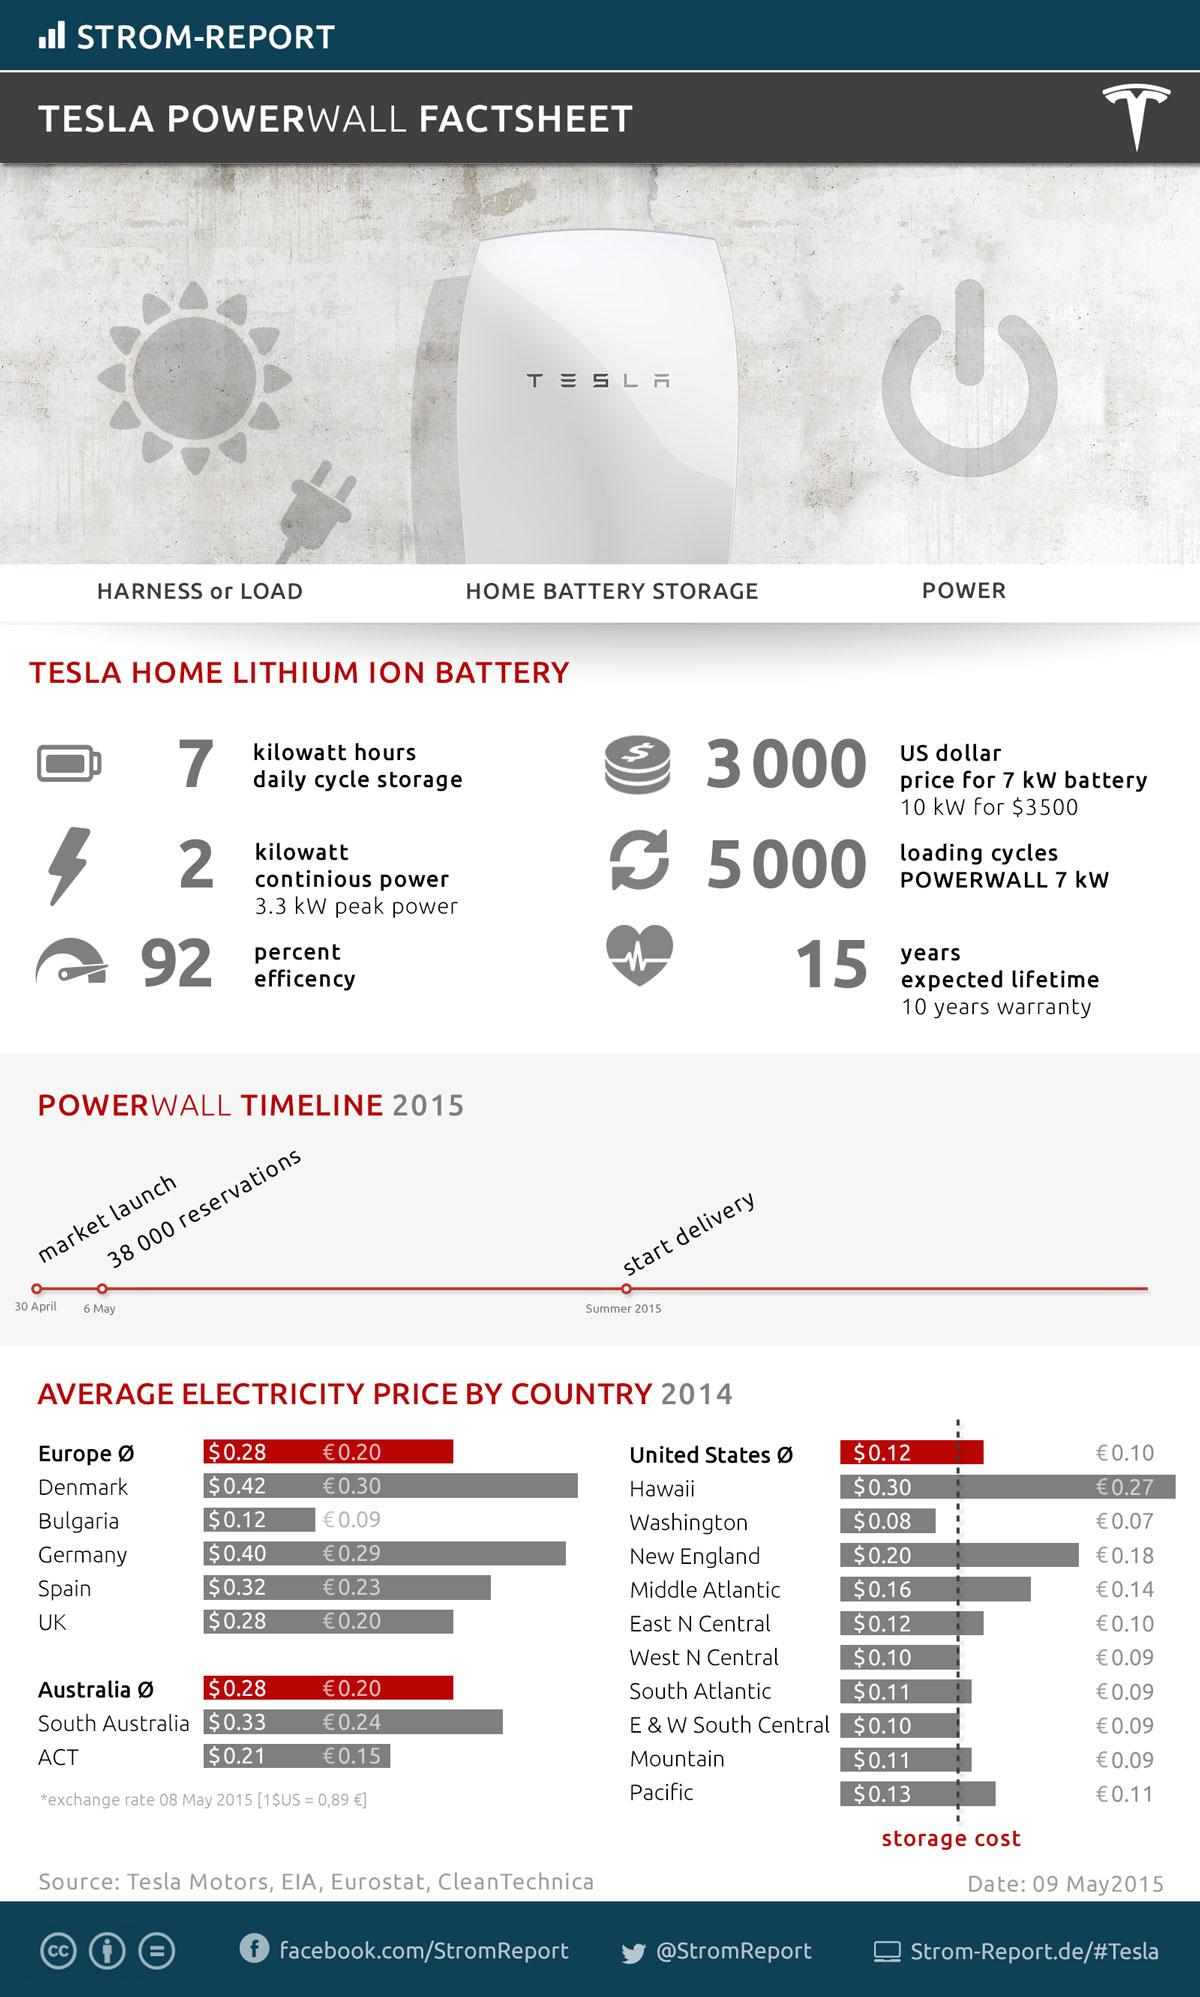 Tesla_Powerwall_Factsheet-social.jpg